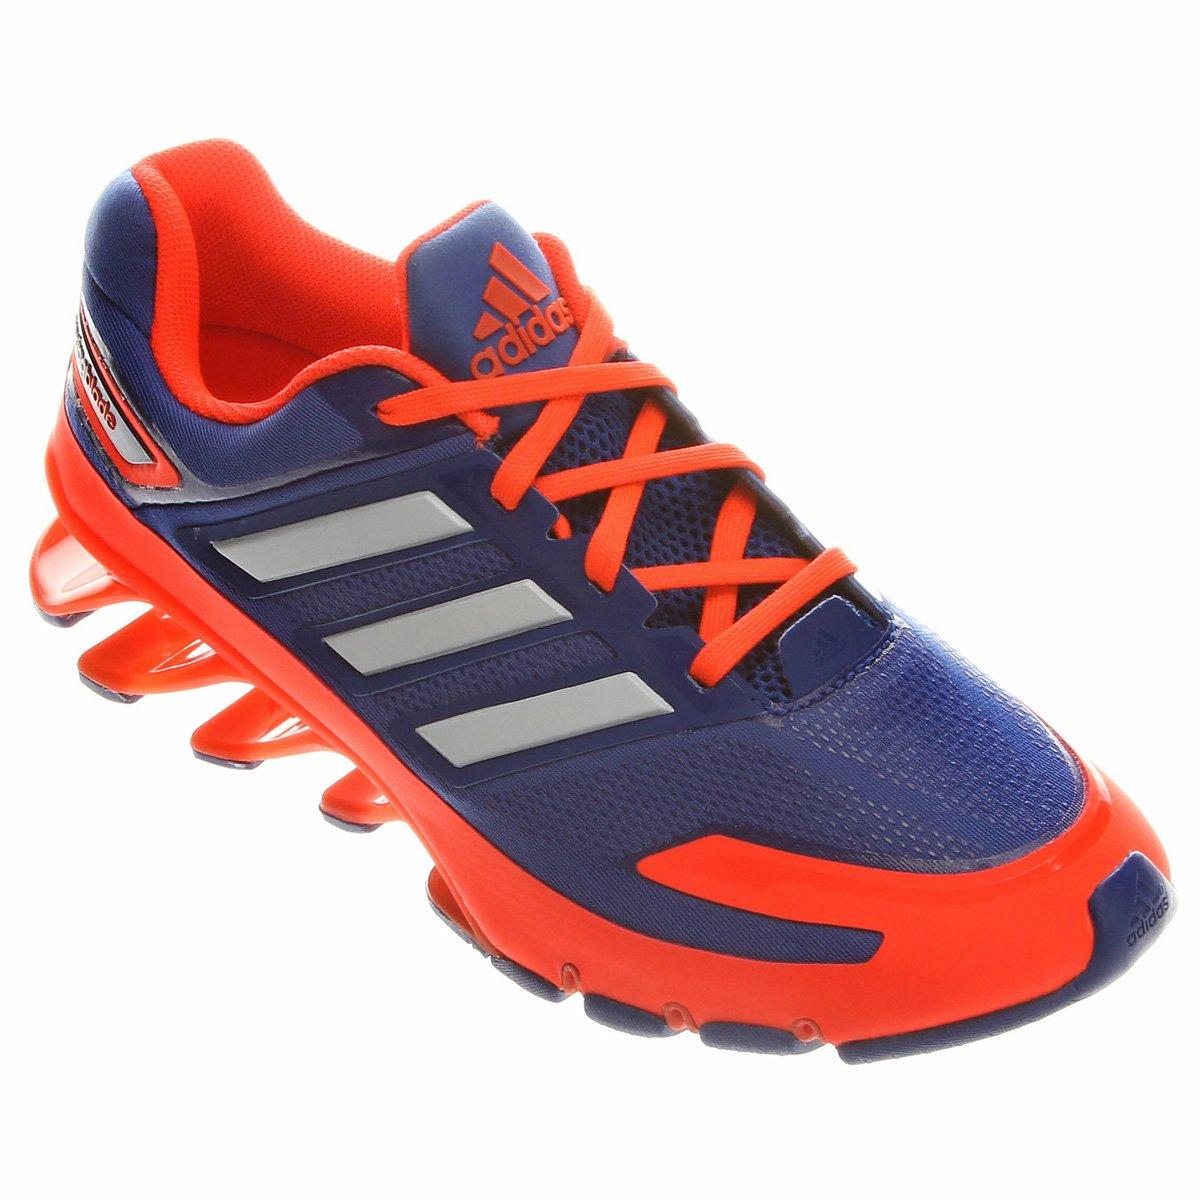 1c215a6f51c ... australia tênis adidas springblade ignite tf masculino 58d2c eebcb